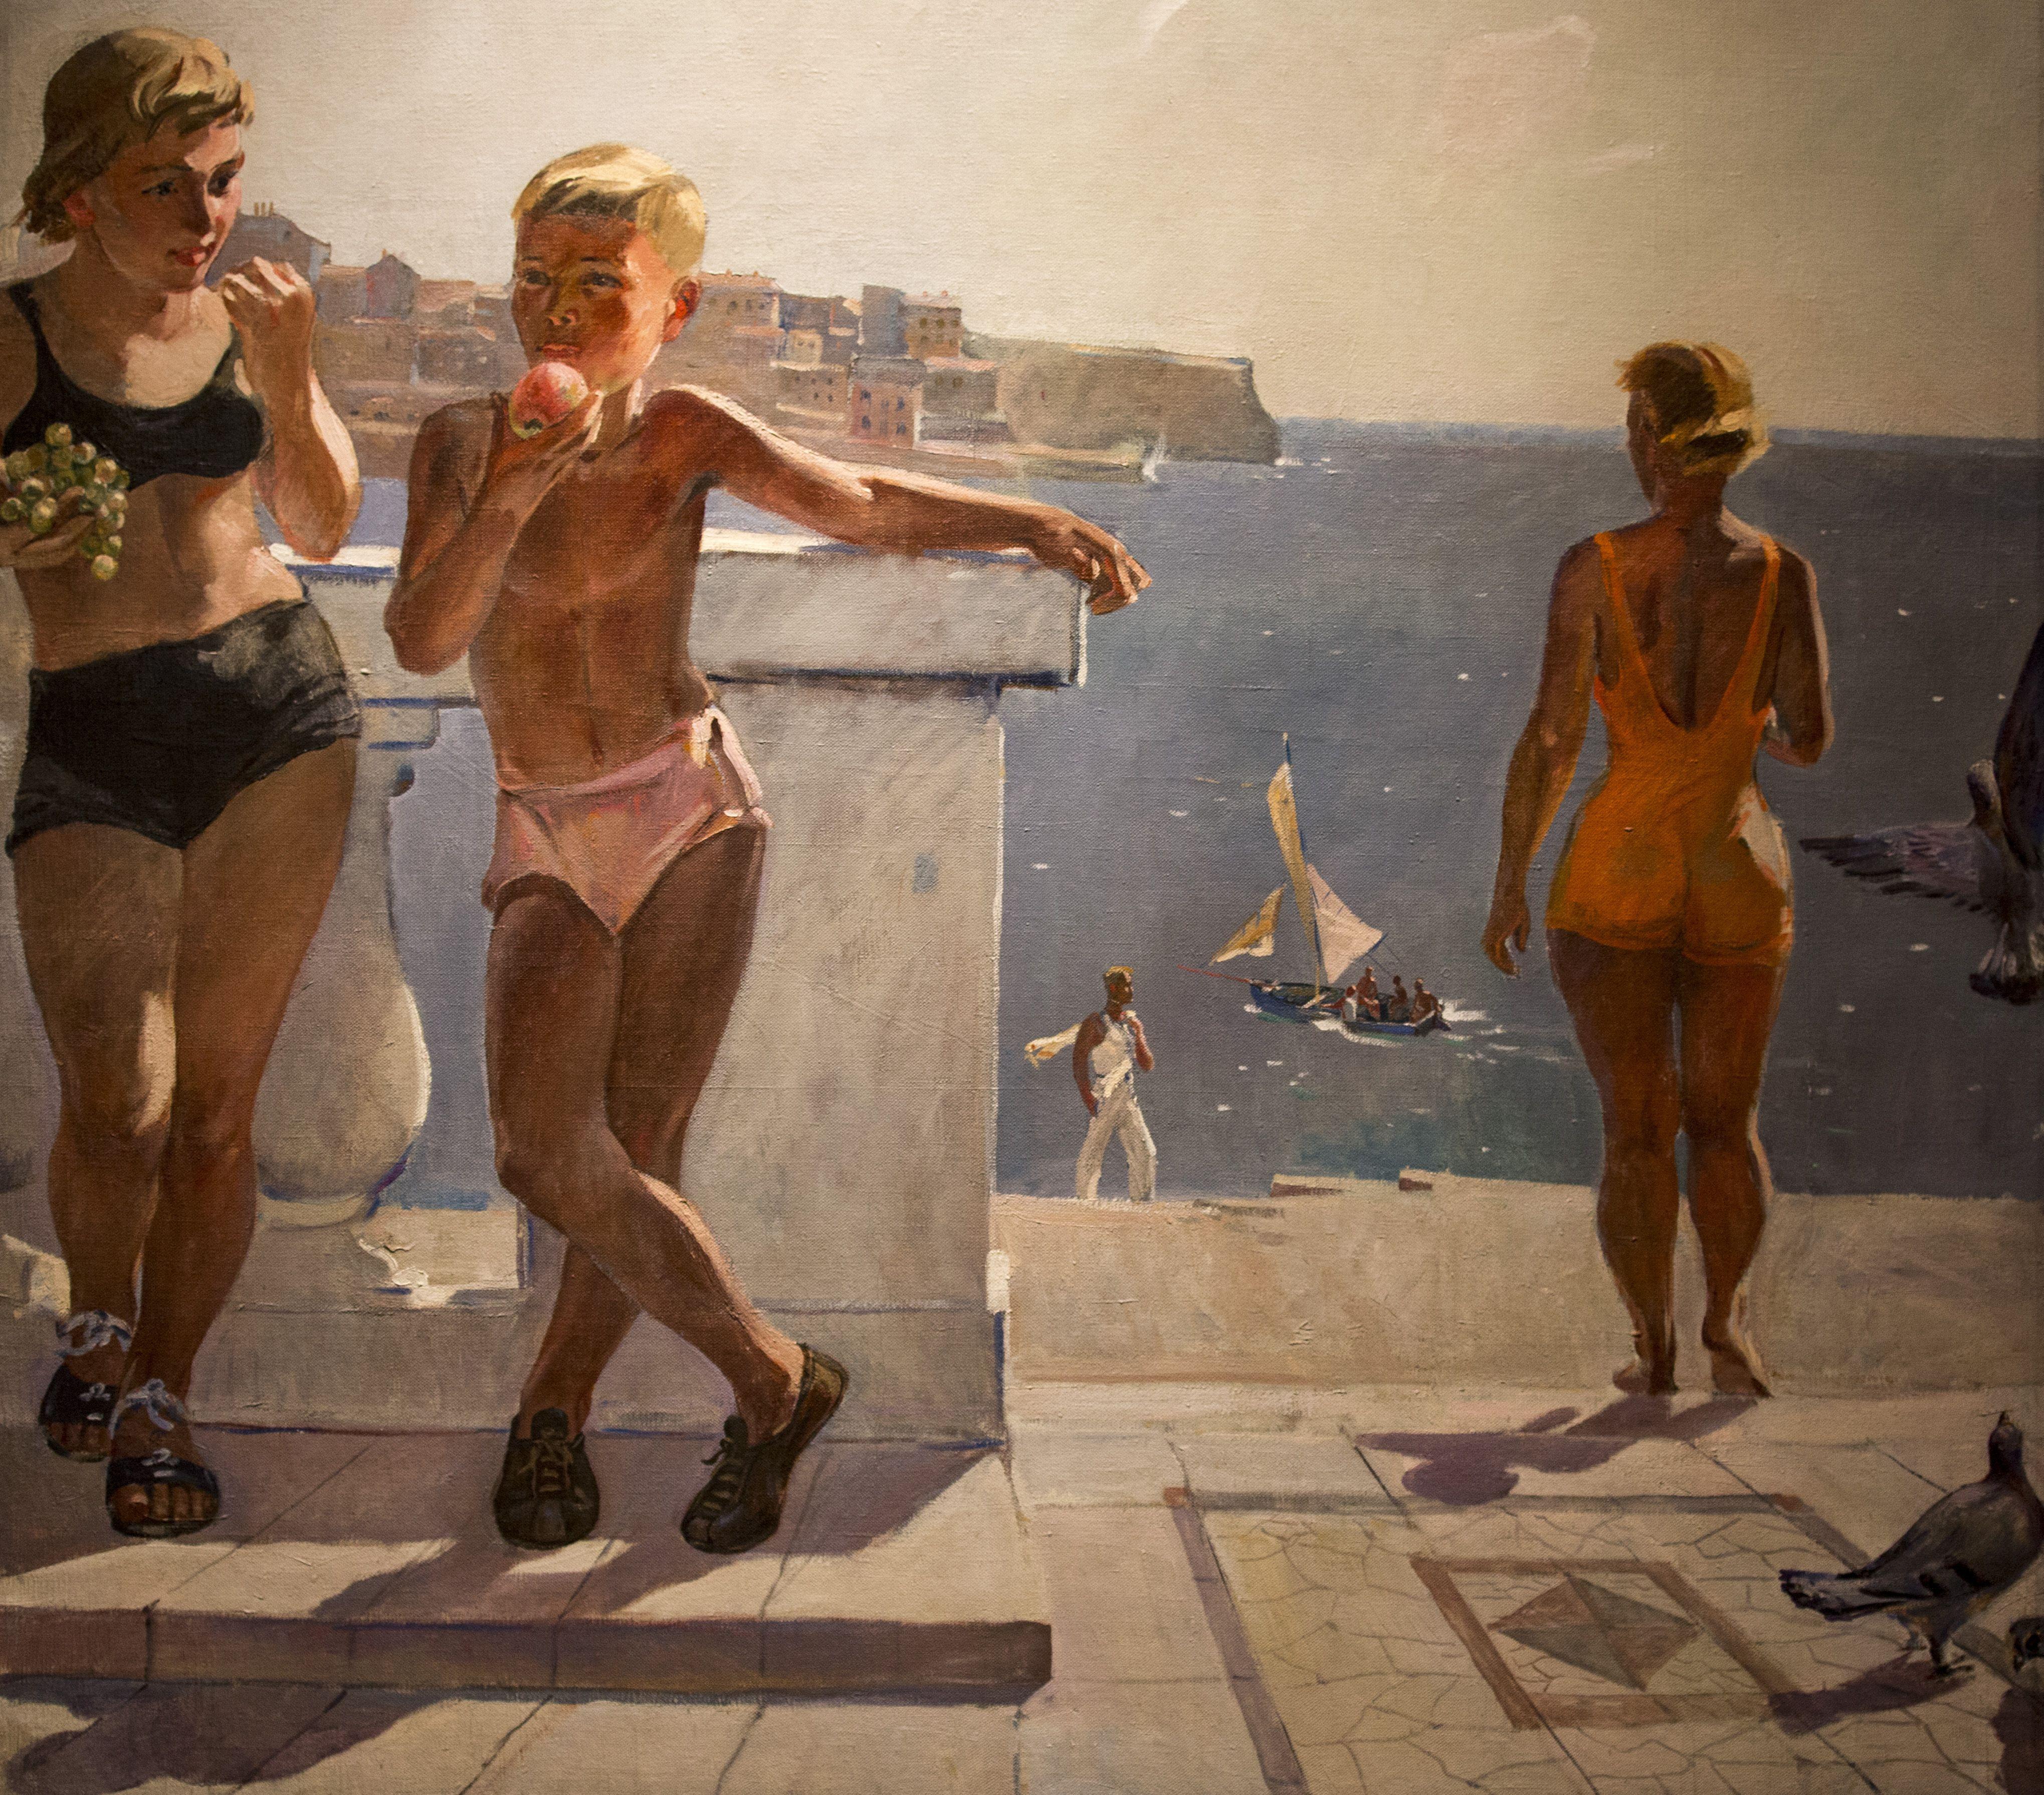 пасмурных картины соцреализма с названиями и авторами фото рыба